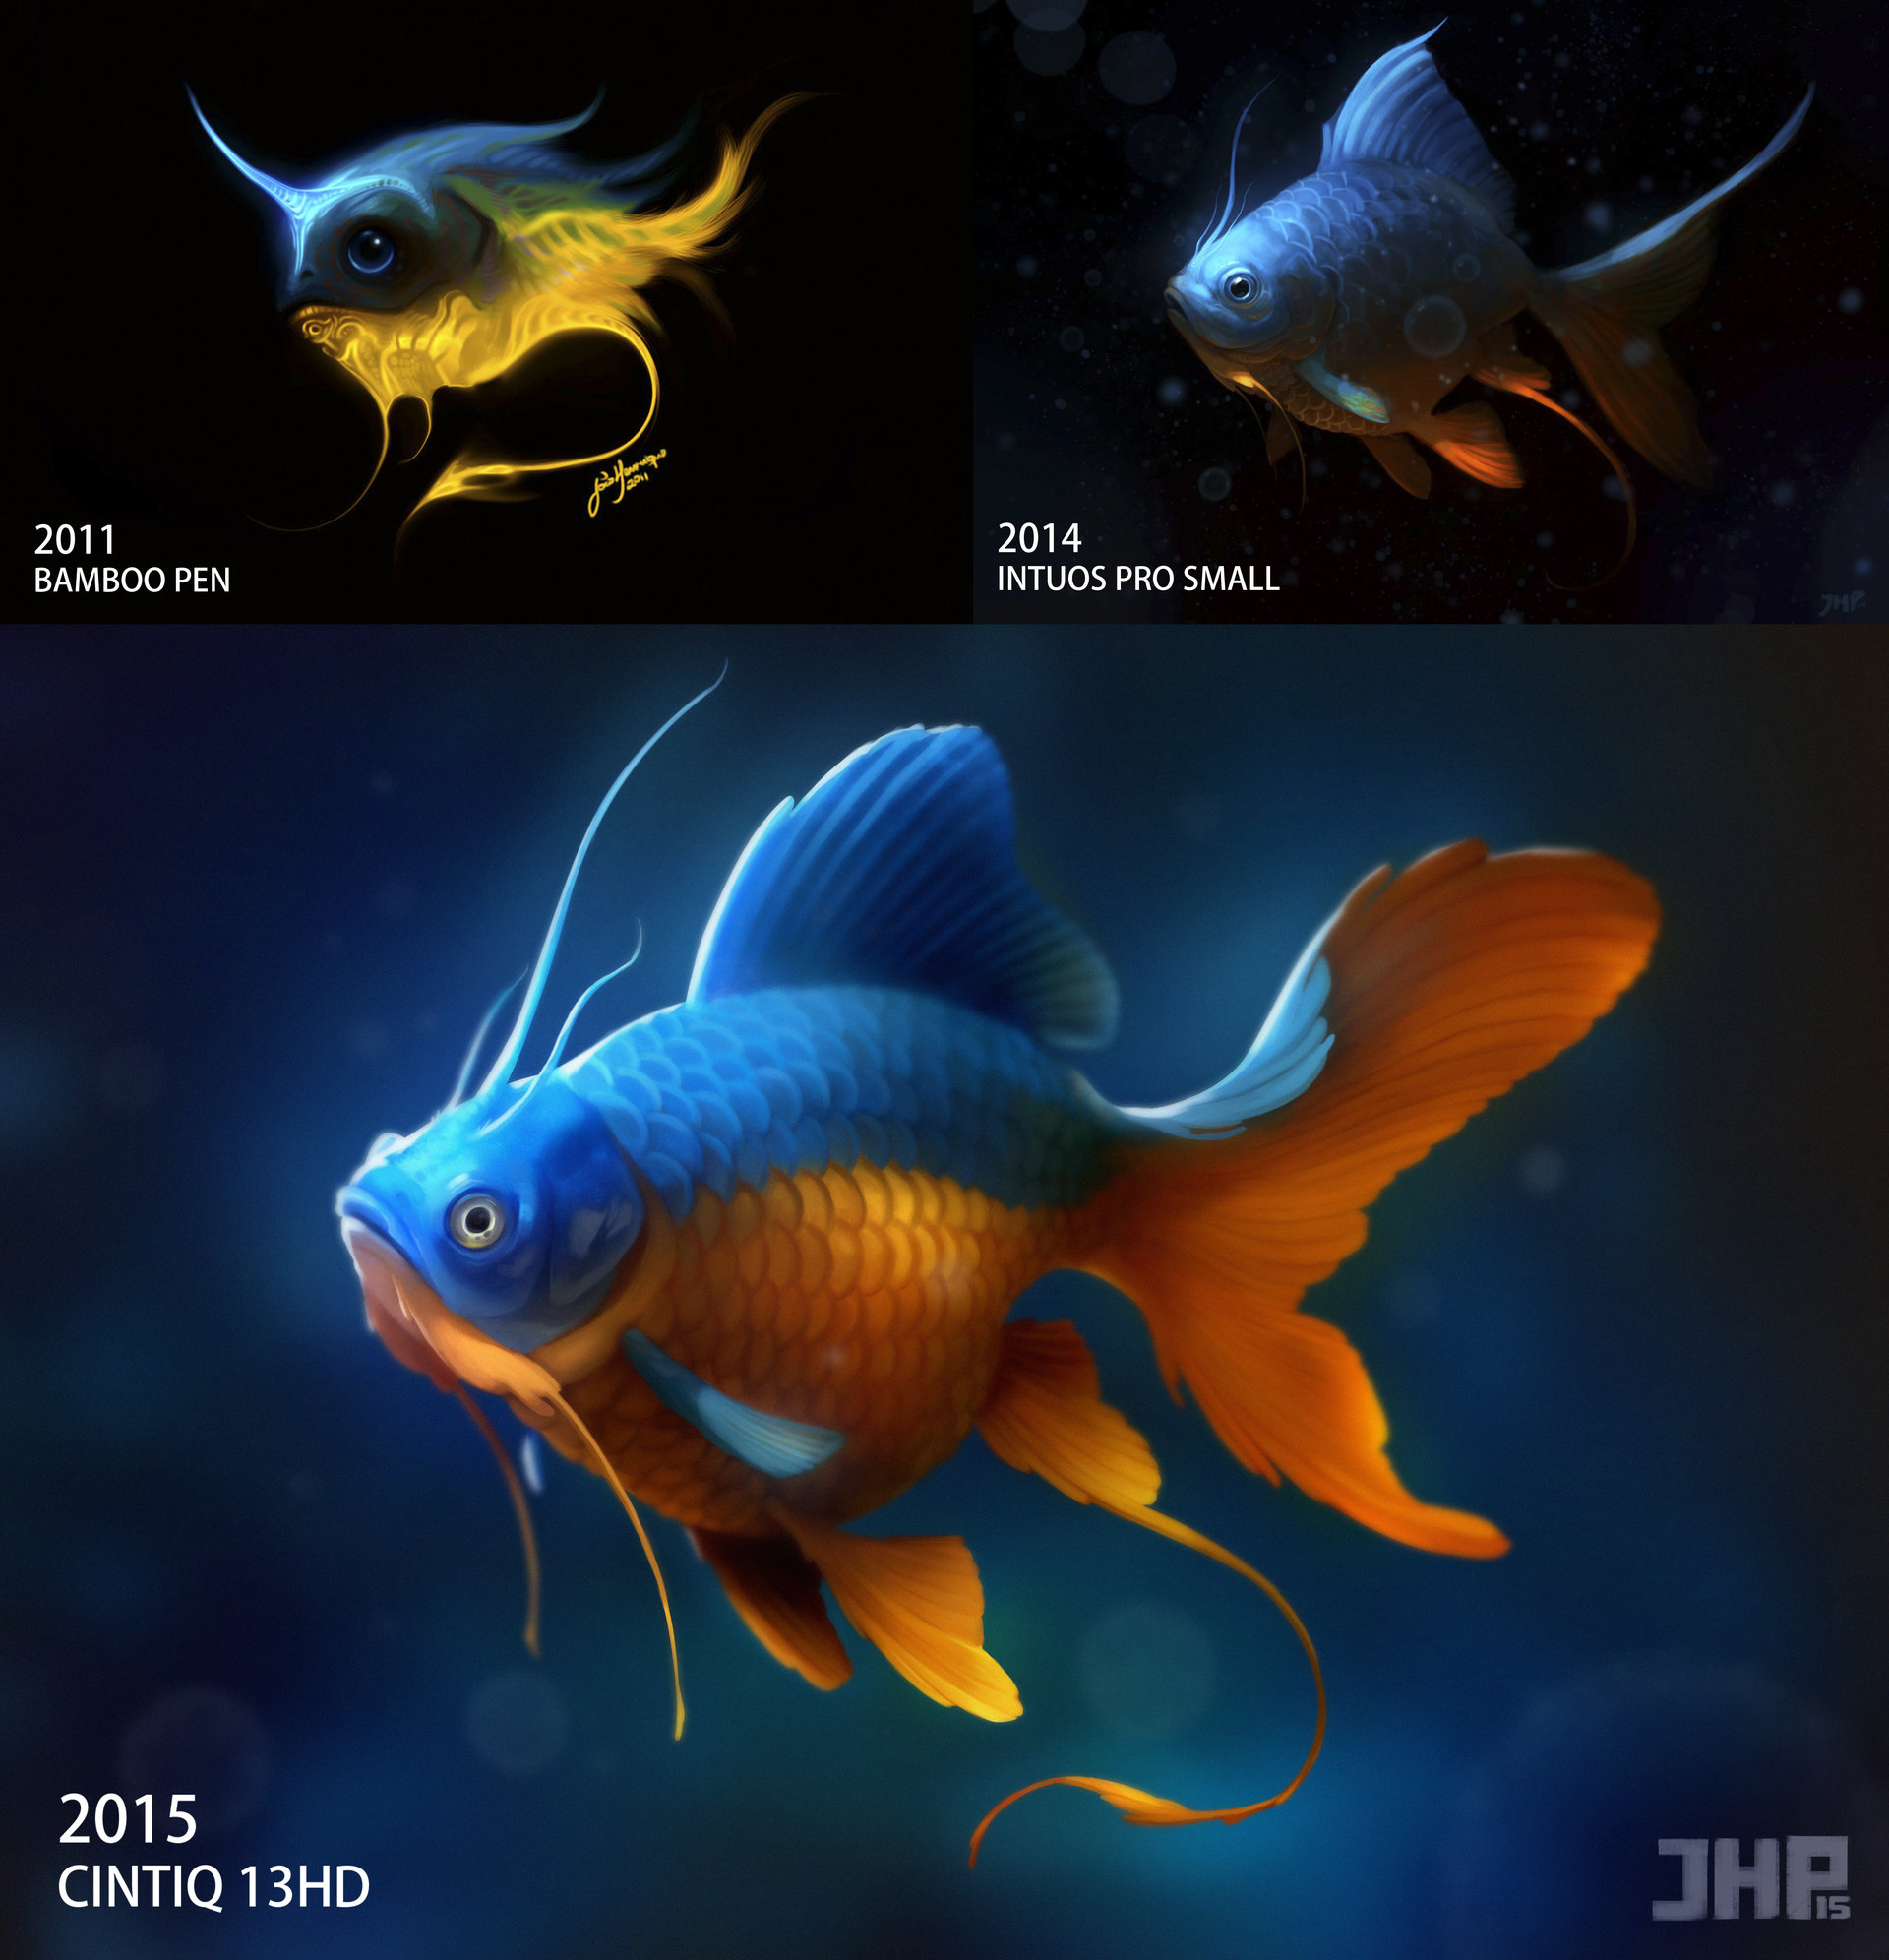 Joao henrique pacheco beta 2015 comparativo copy